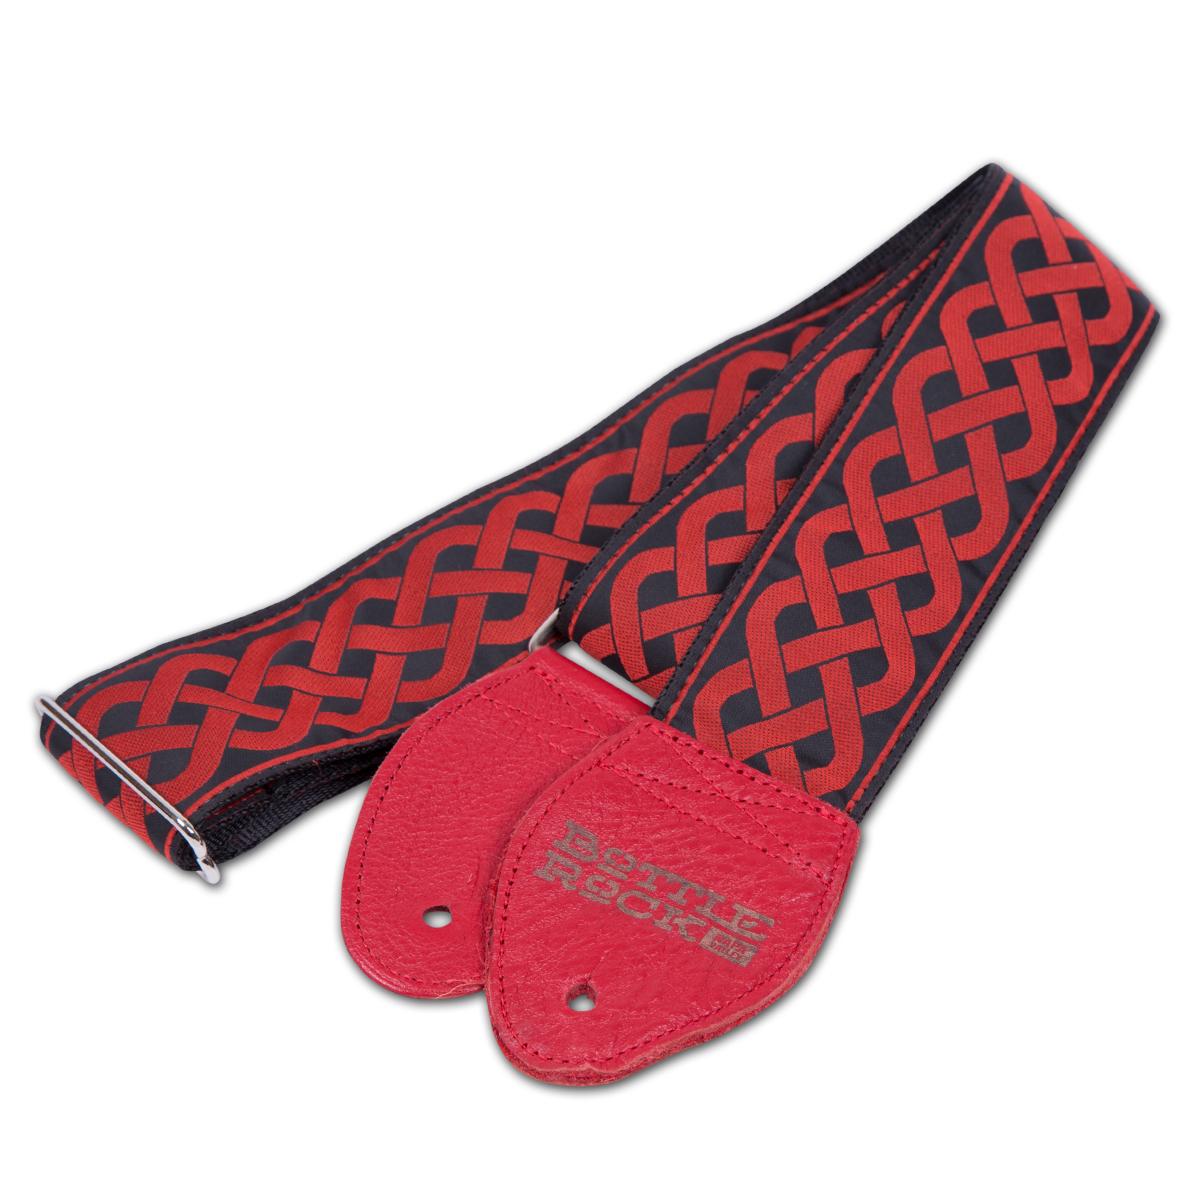 BottleRock Guitar Strap - Red